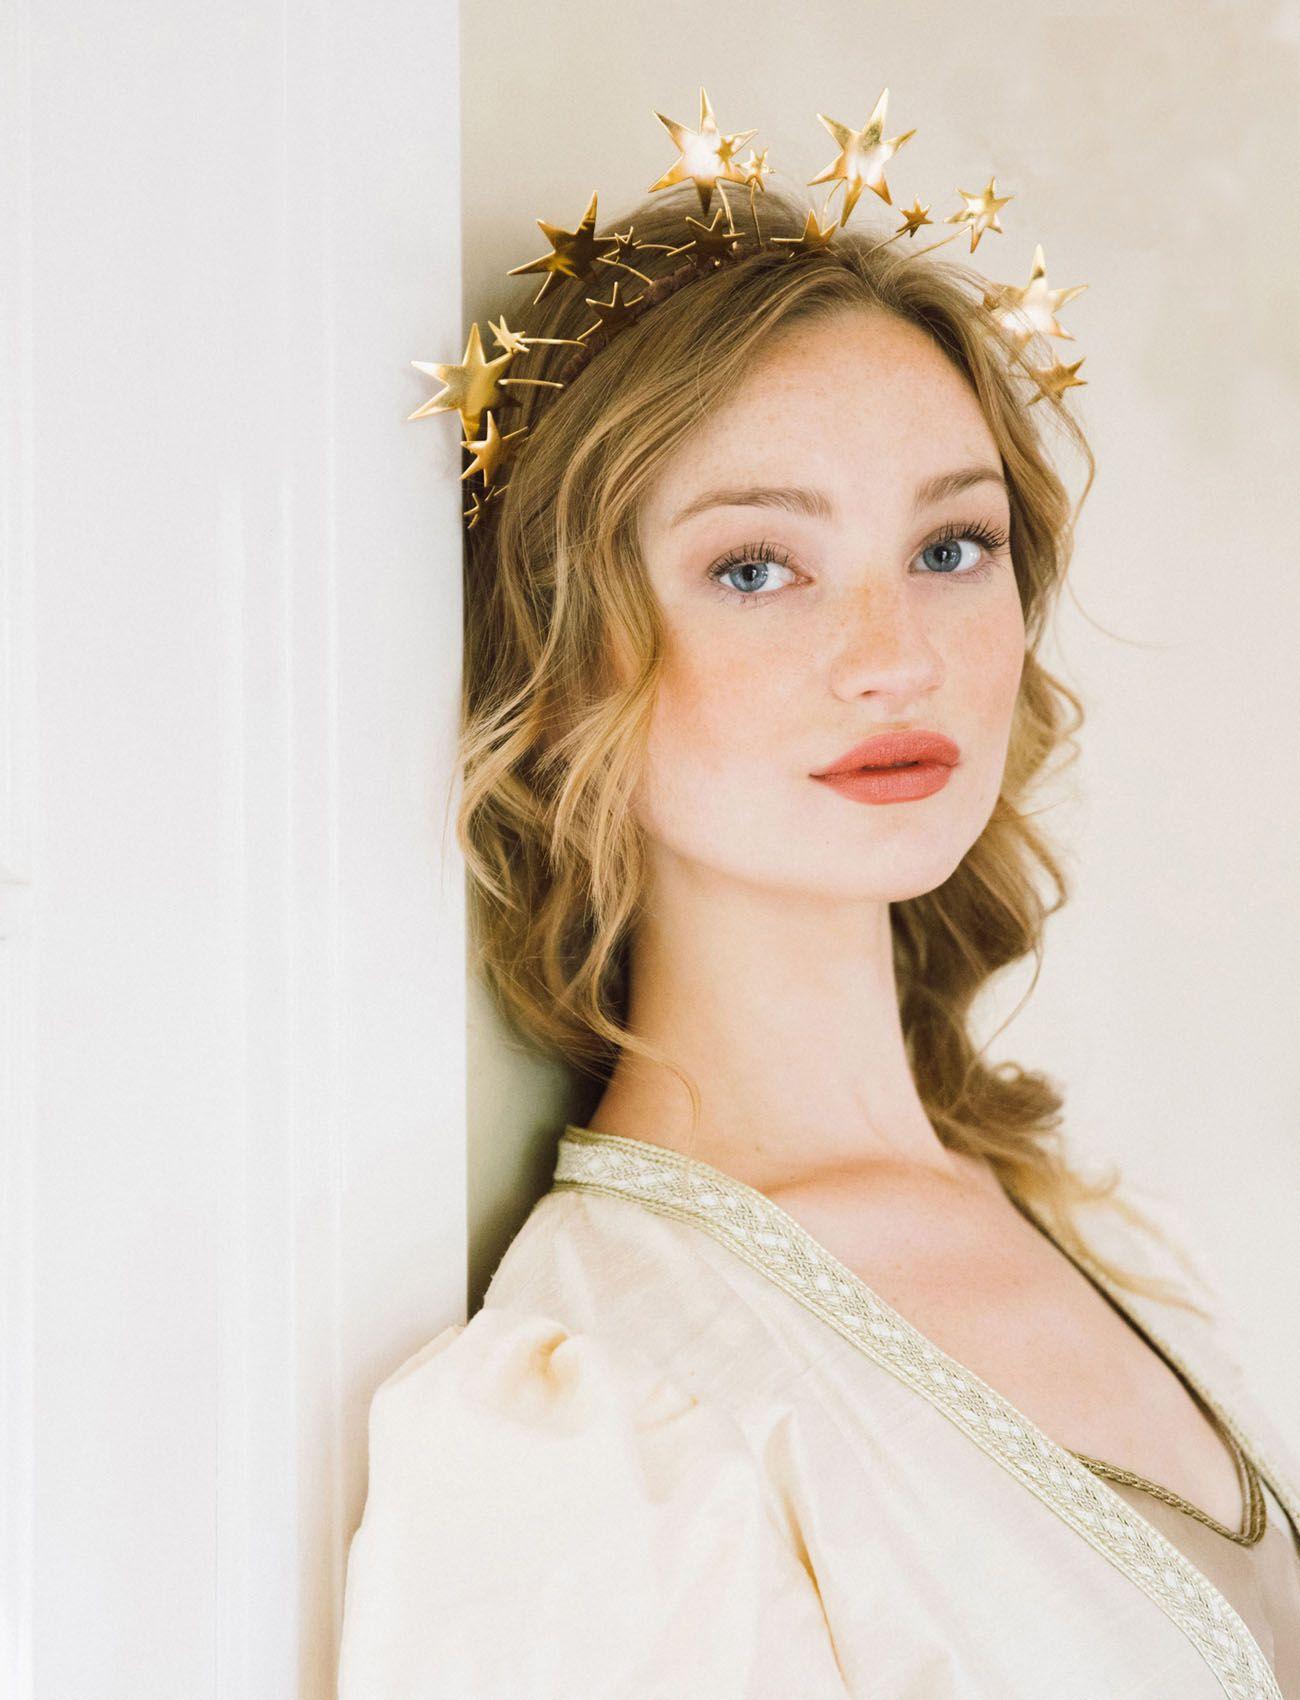 Halo Crown Moon Stars Goddess Crown Halo Headband Bridal Headpiece Tiara Boho Wedding Accessory